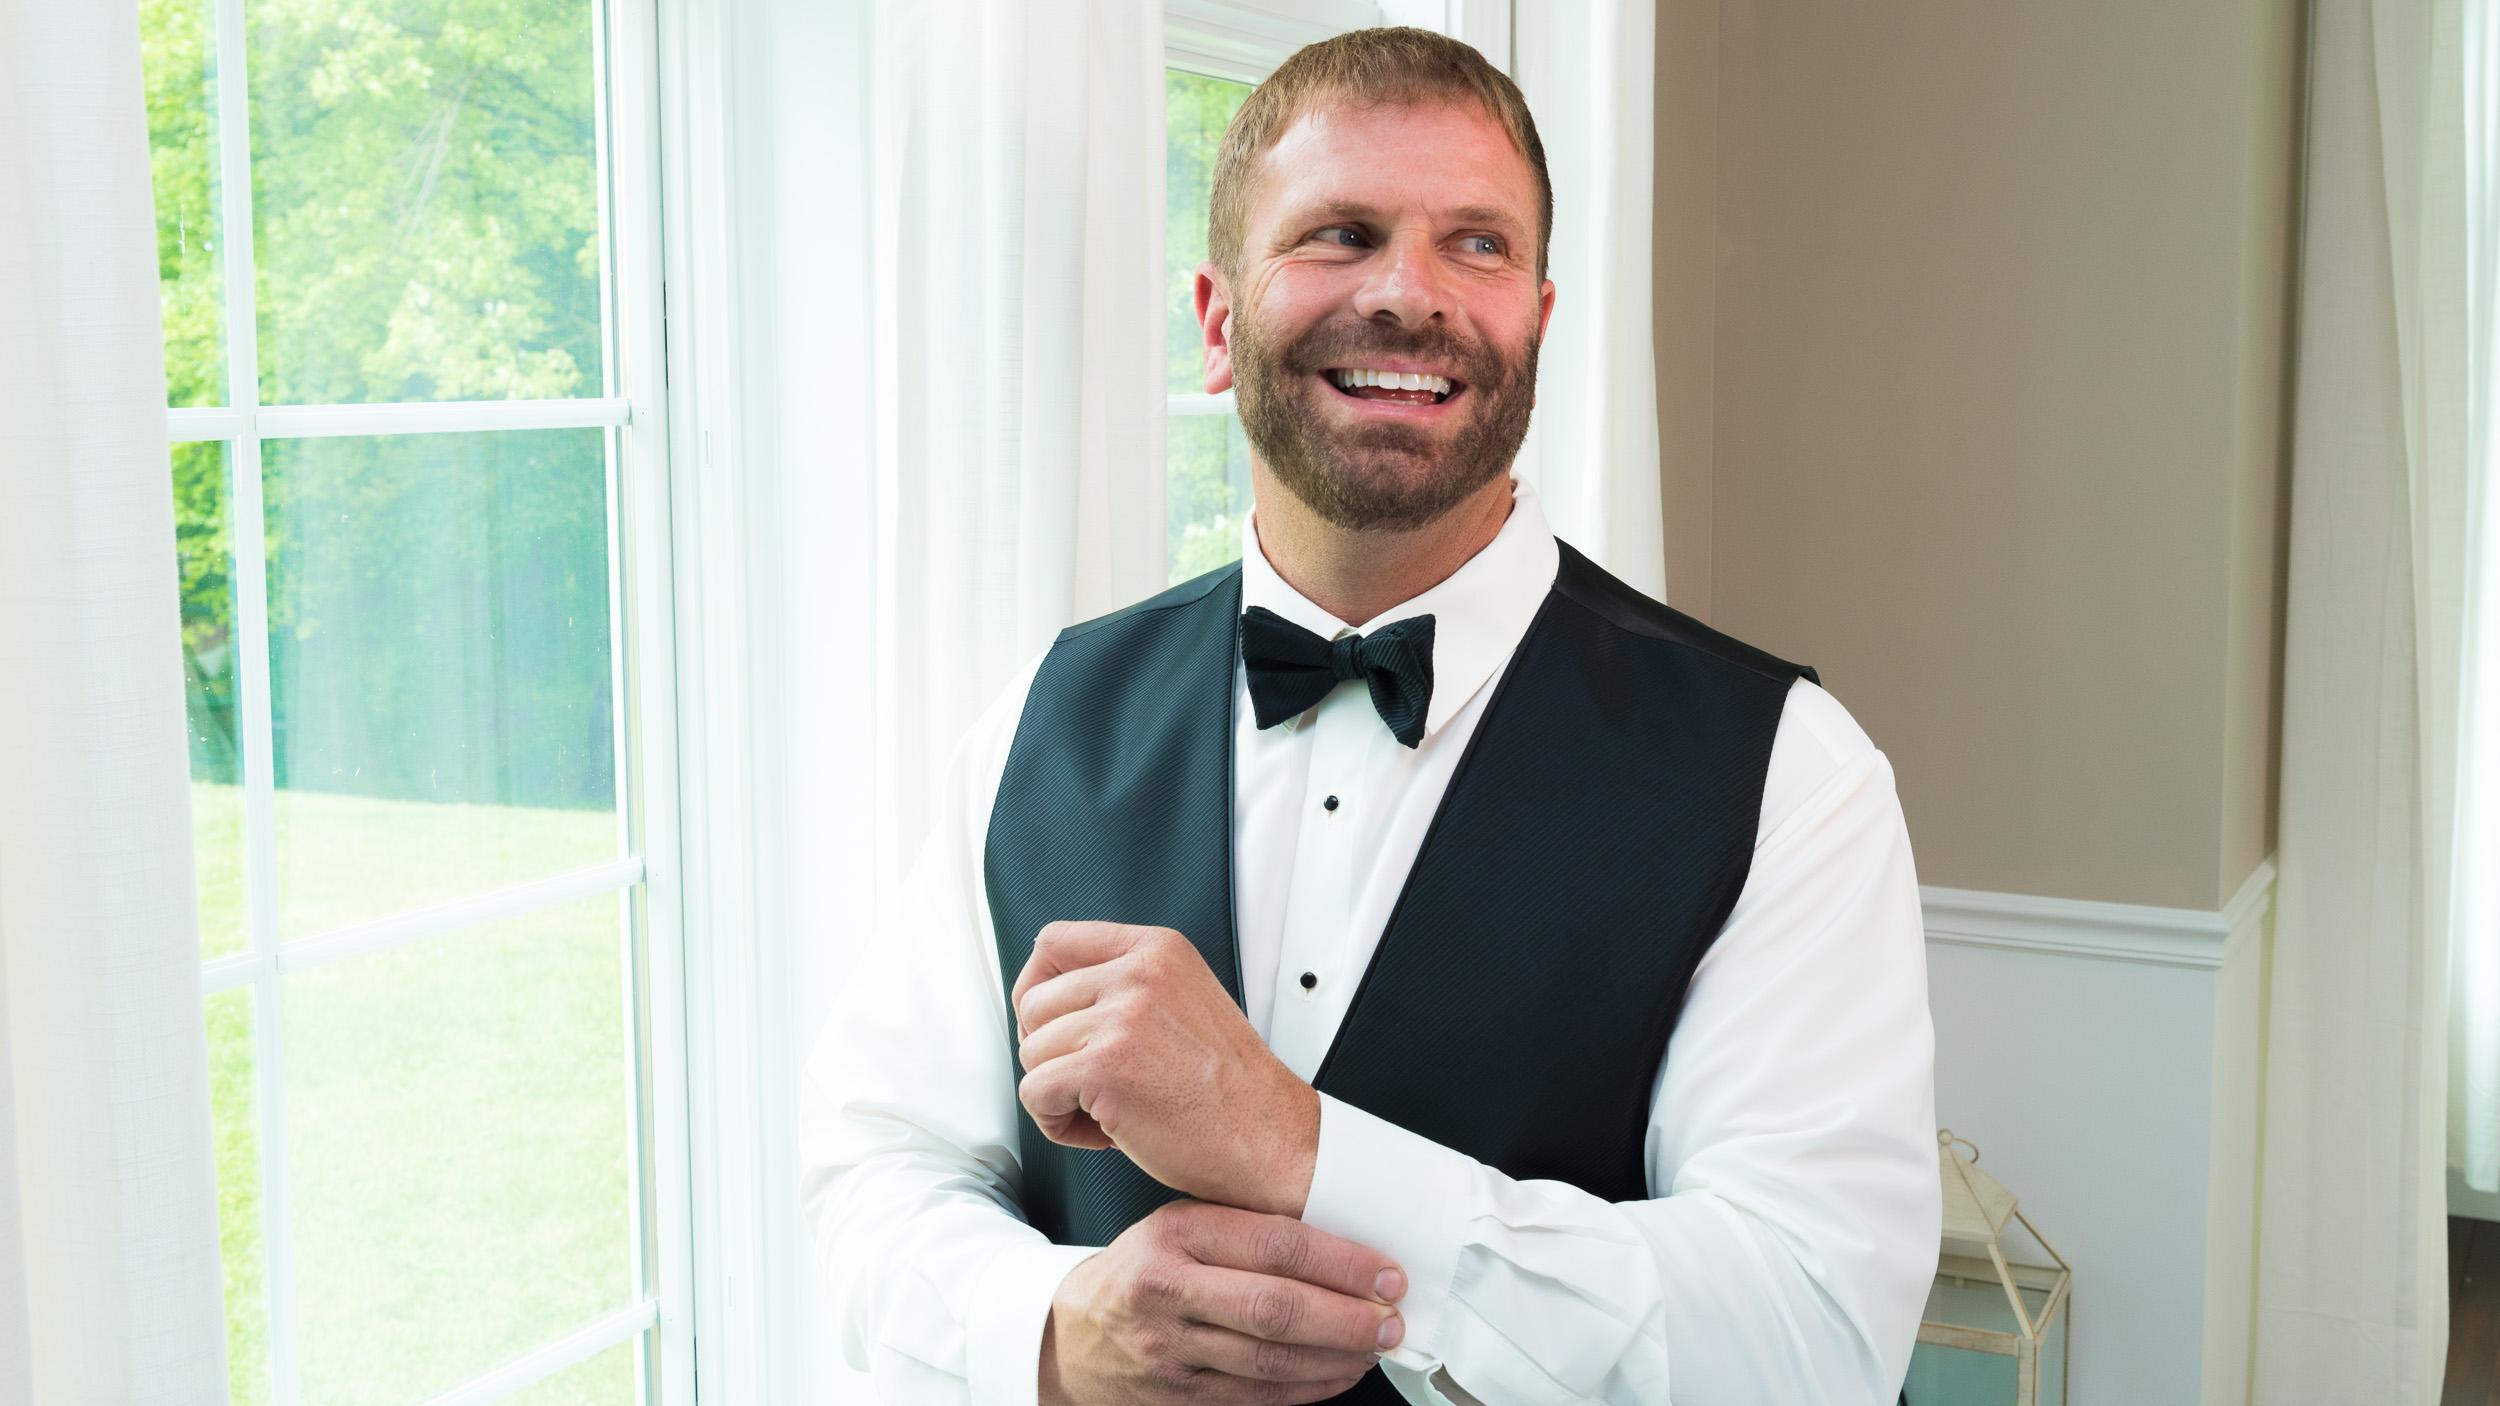 groom-getting-ready-by-window.jpg